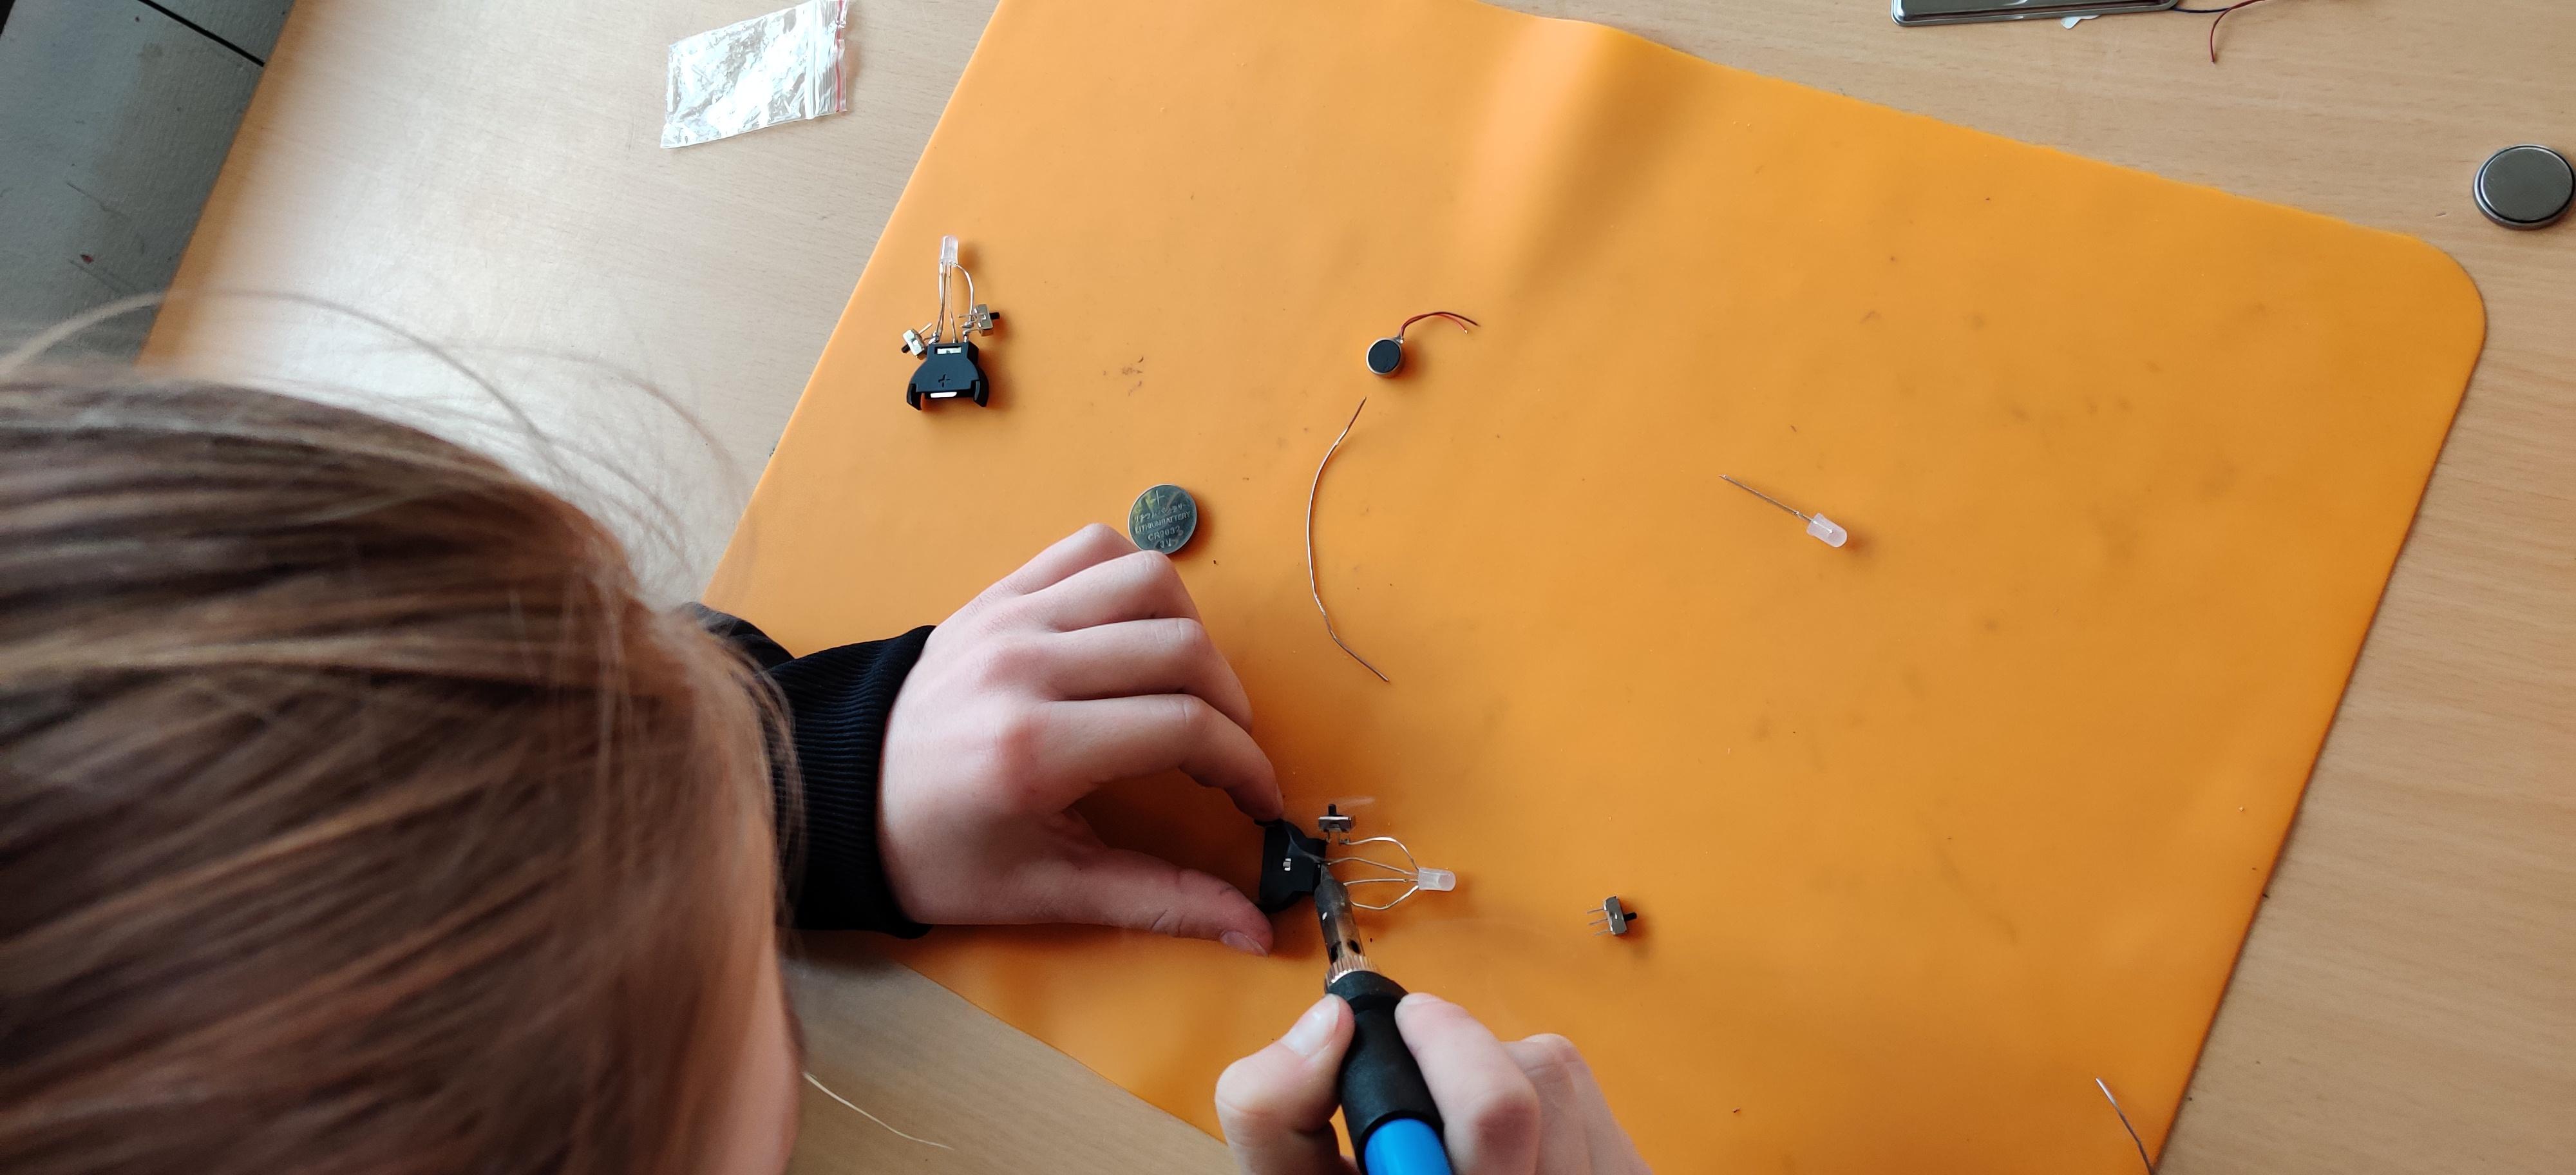 shop – Startset 20-30x trilrobot en led licht voor één klas (30x drie oefeningen)